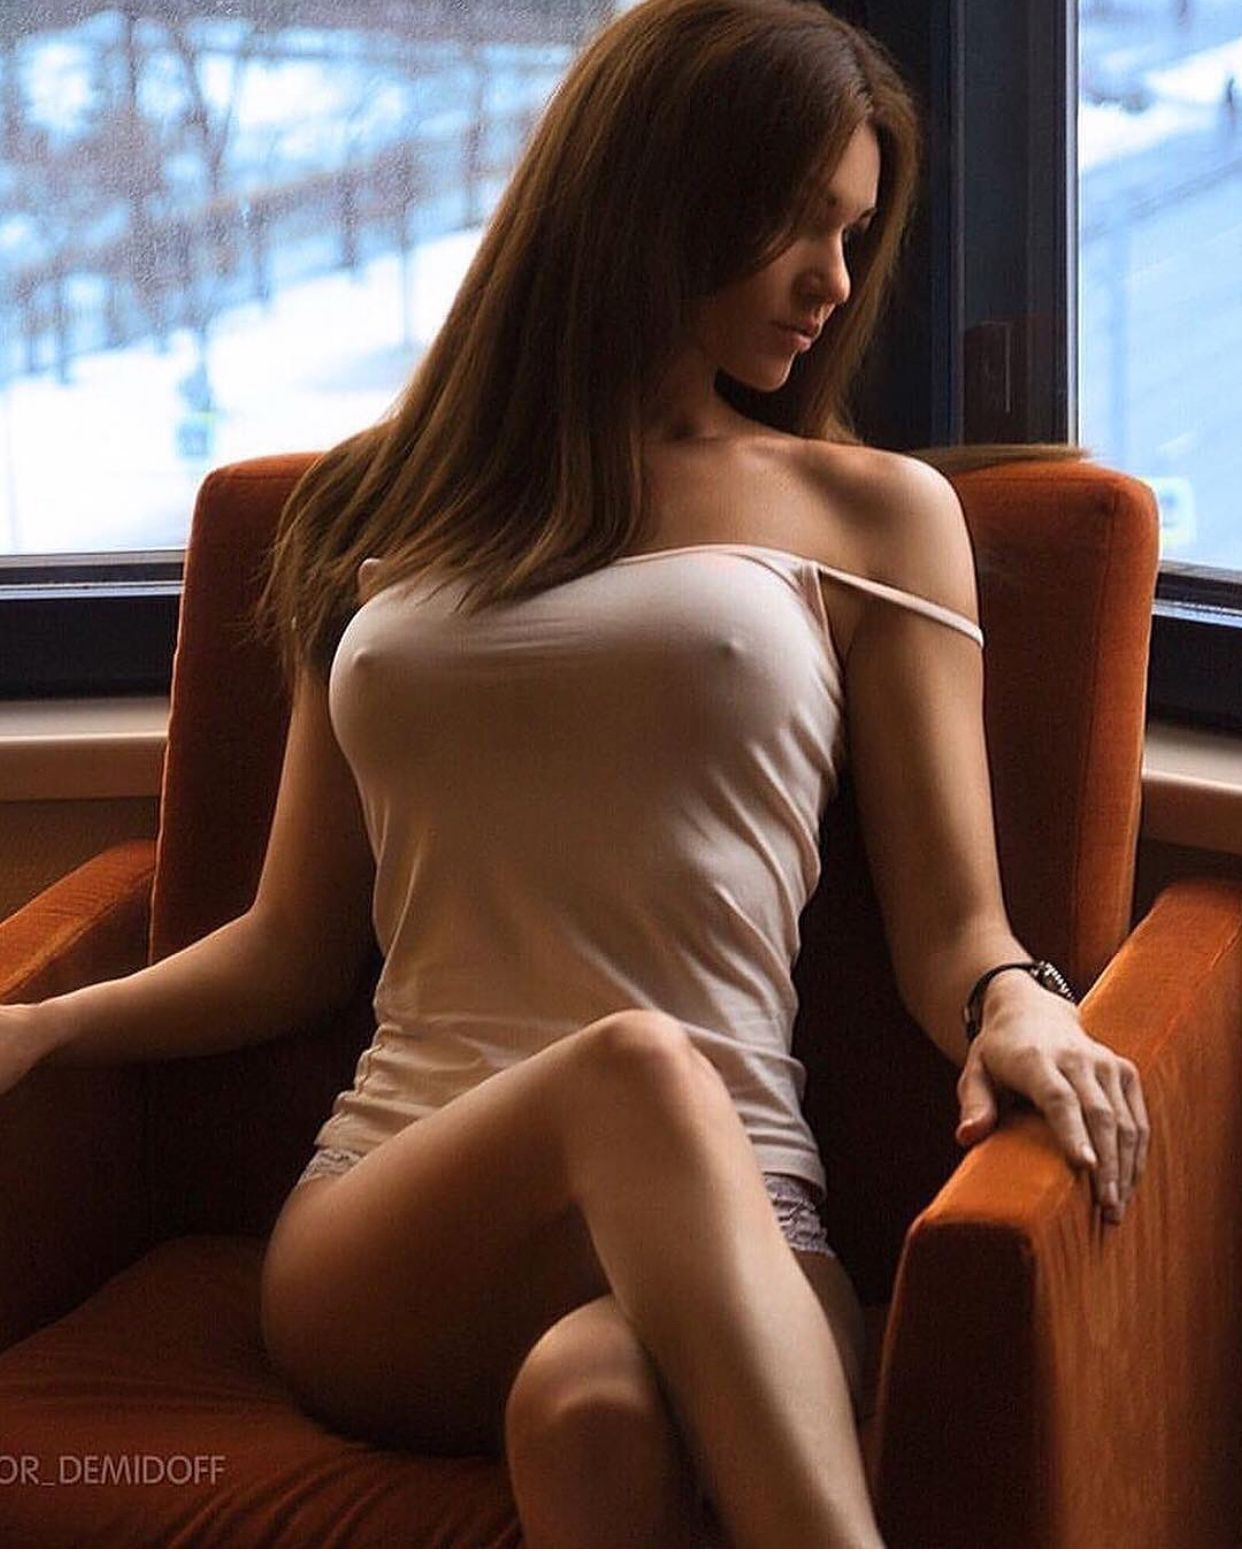 hot-girls-fucked-hott-naked-boy-outdoor